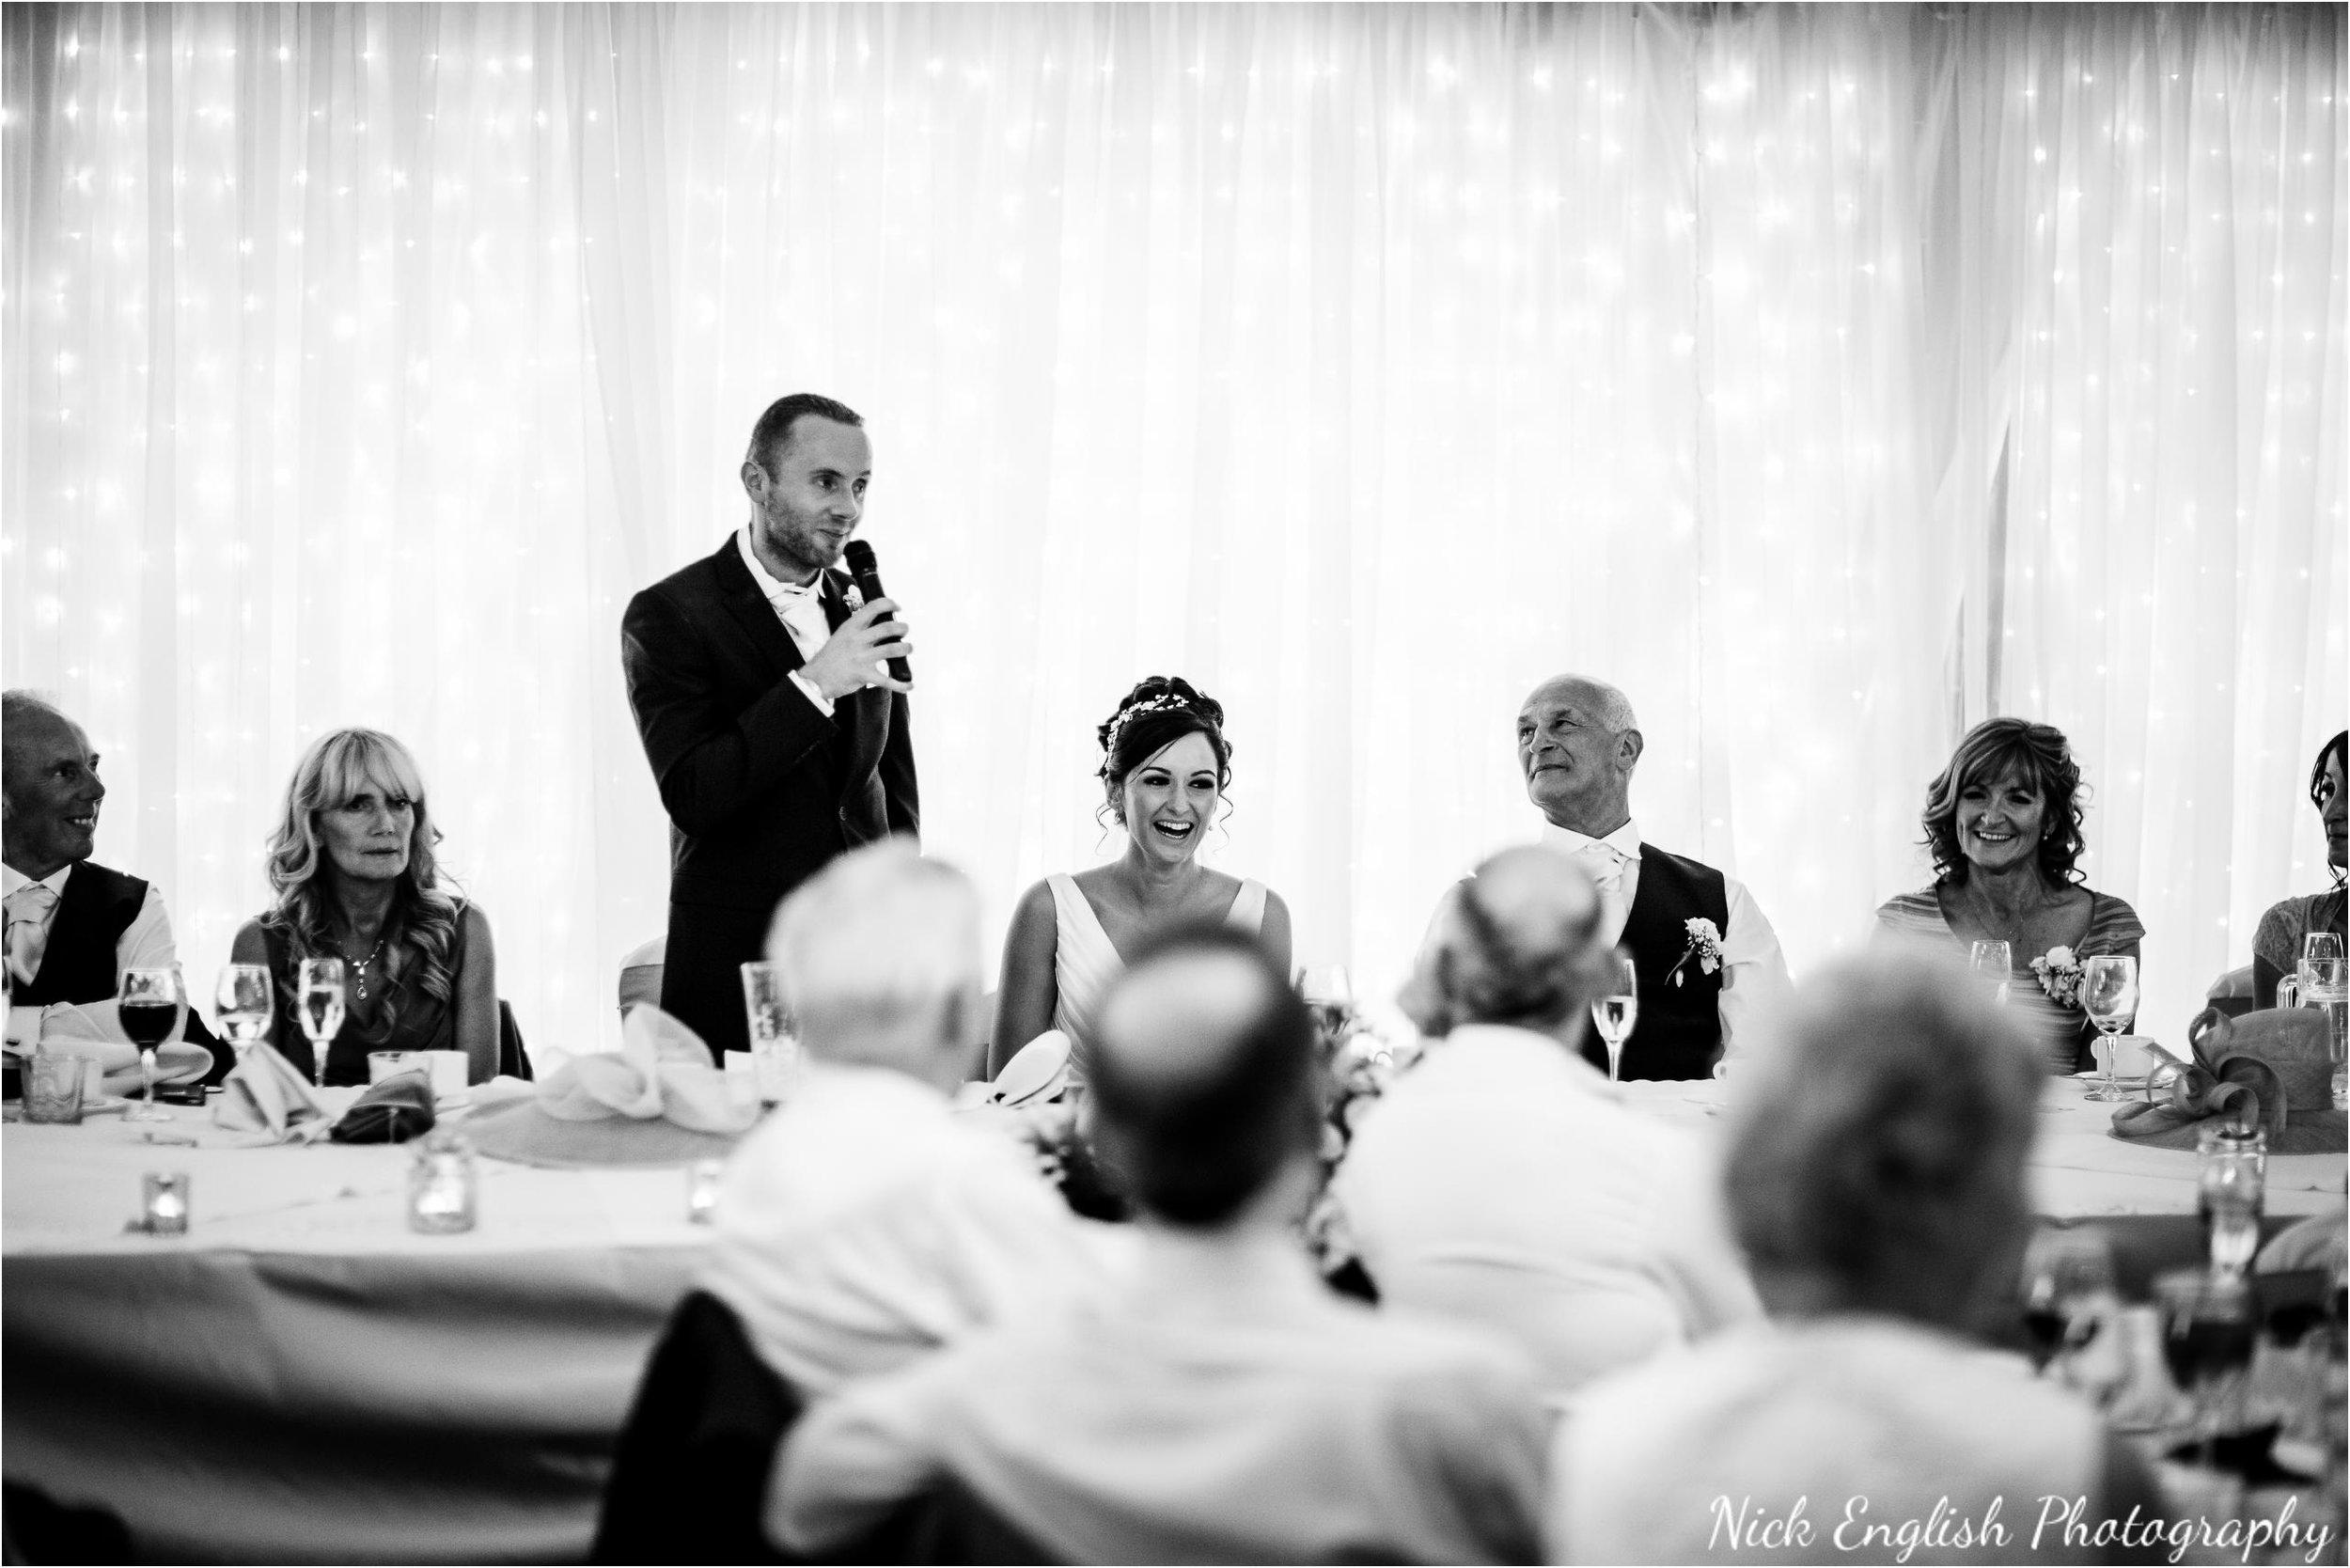 Emily David Wedding Photographs at Barton Grange Preston by Nick English Photography 173jpg.jpeg